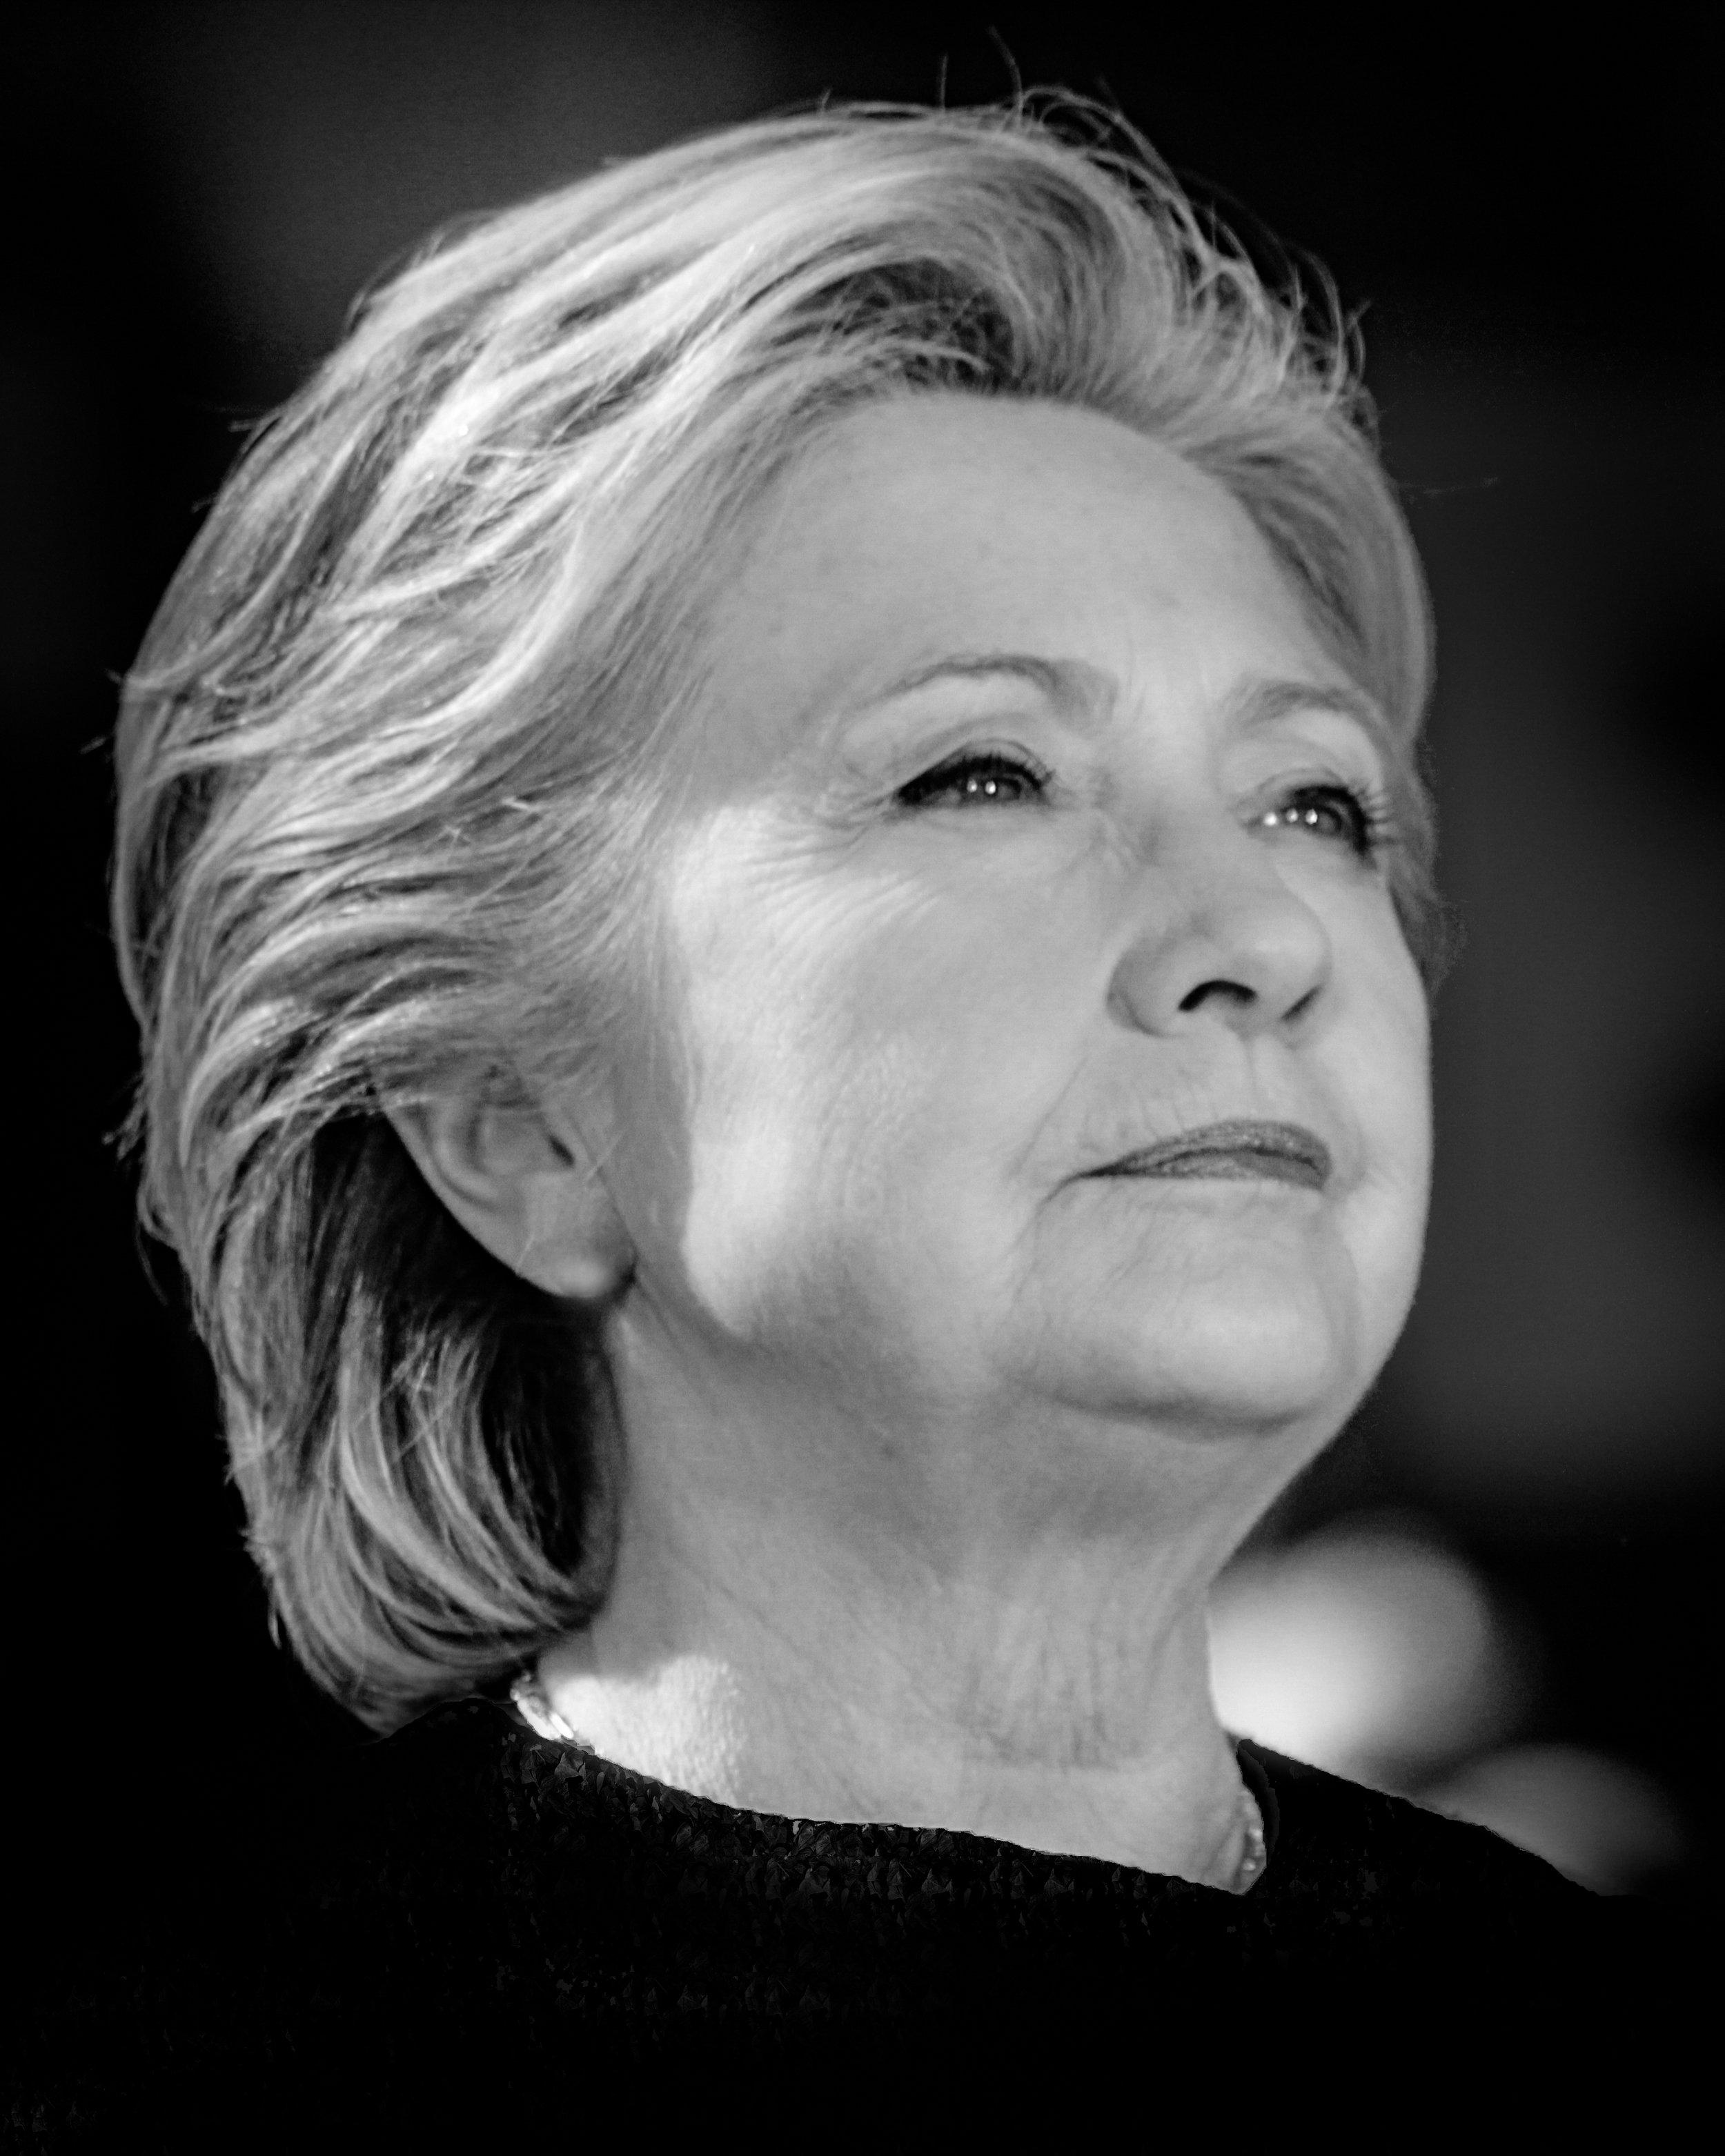 Hillary Clinton Portrait 14